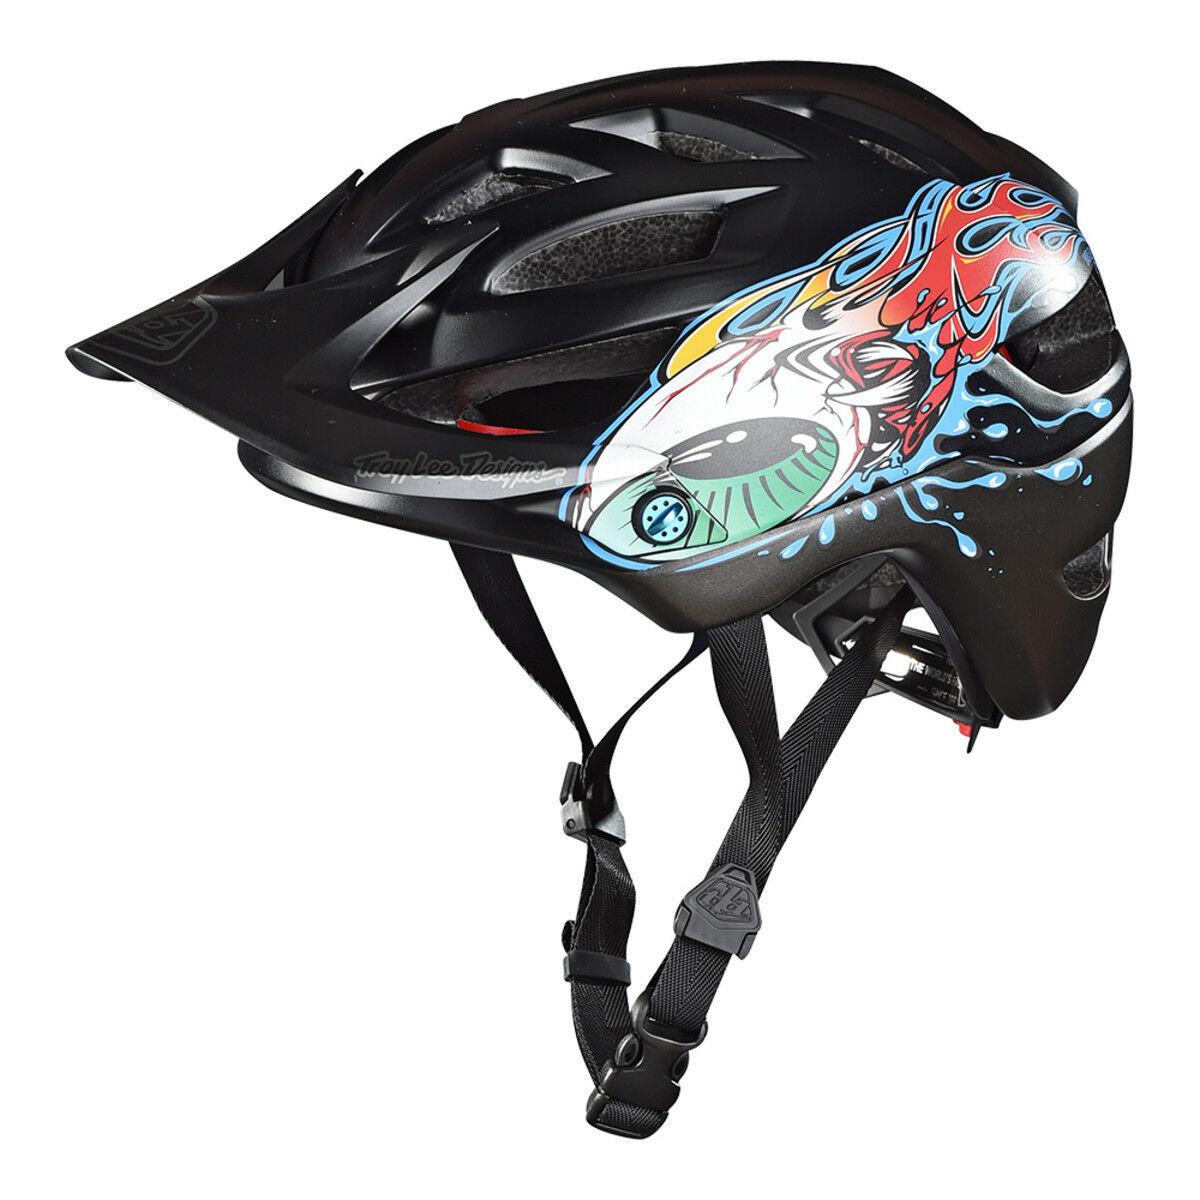 2018 TLD Troy Lee Designs Youth A1 Mips Eyeball Mountain Bike Helmet DH Cycle